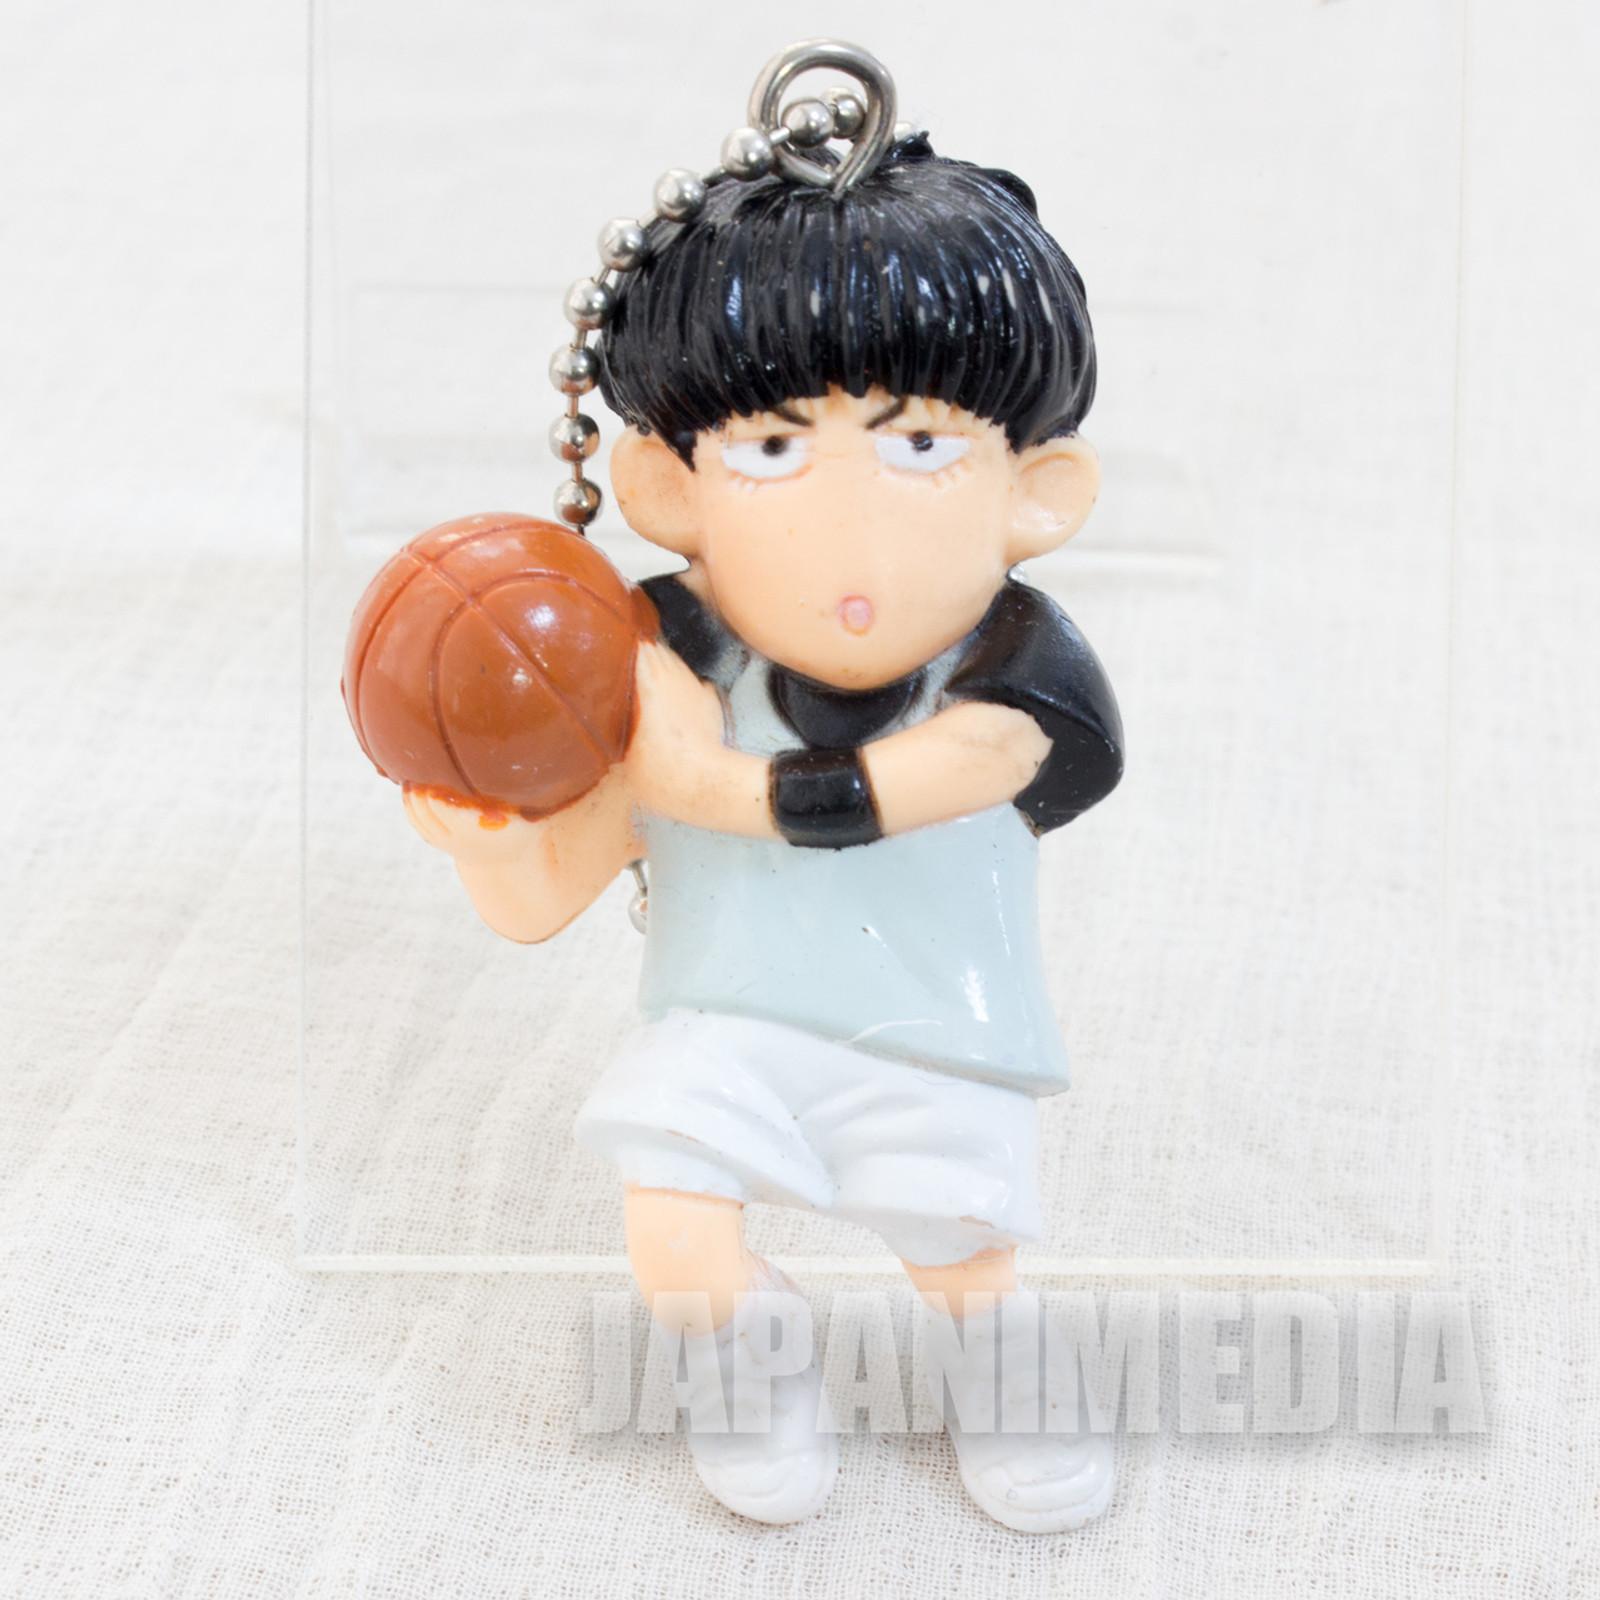 SLAM DUNK Kaede Rukawa Mini Figure Ball Key Chain JAPAN ANIME MANGA 3